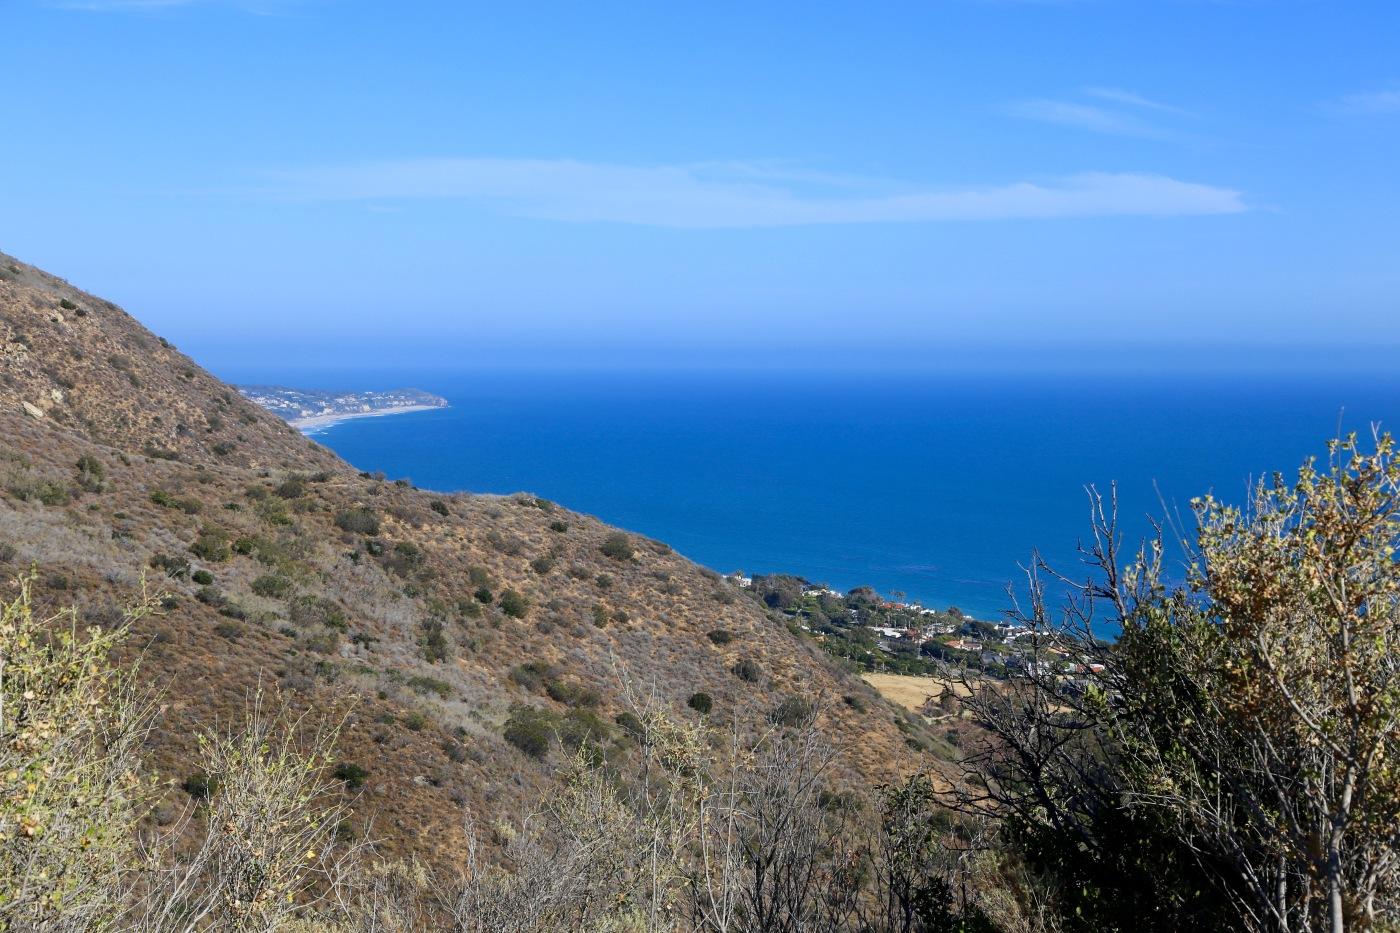 Day 130/4 Malibu and Santa Monica